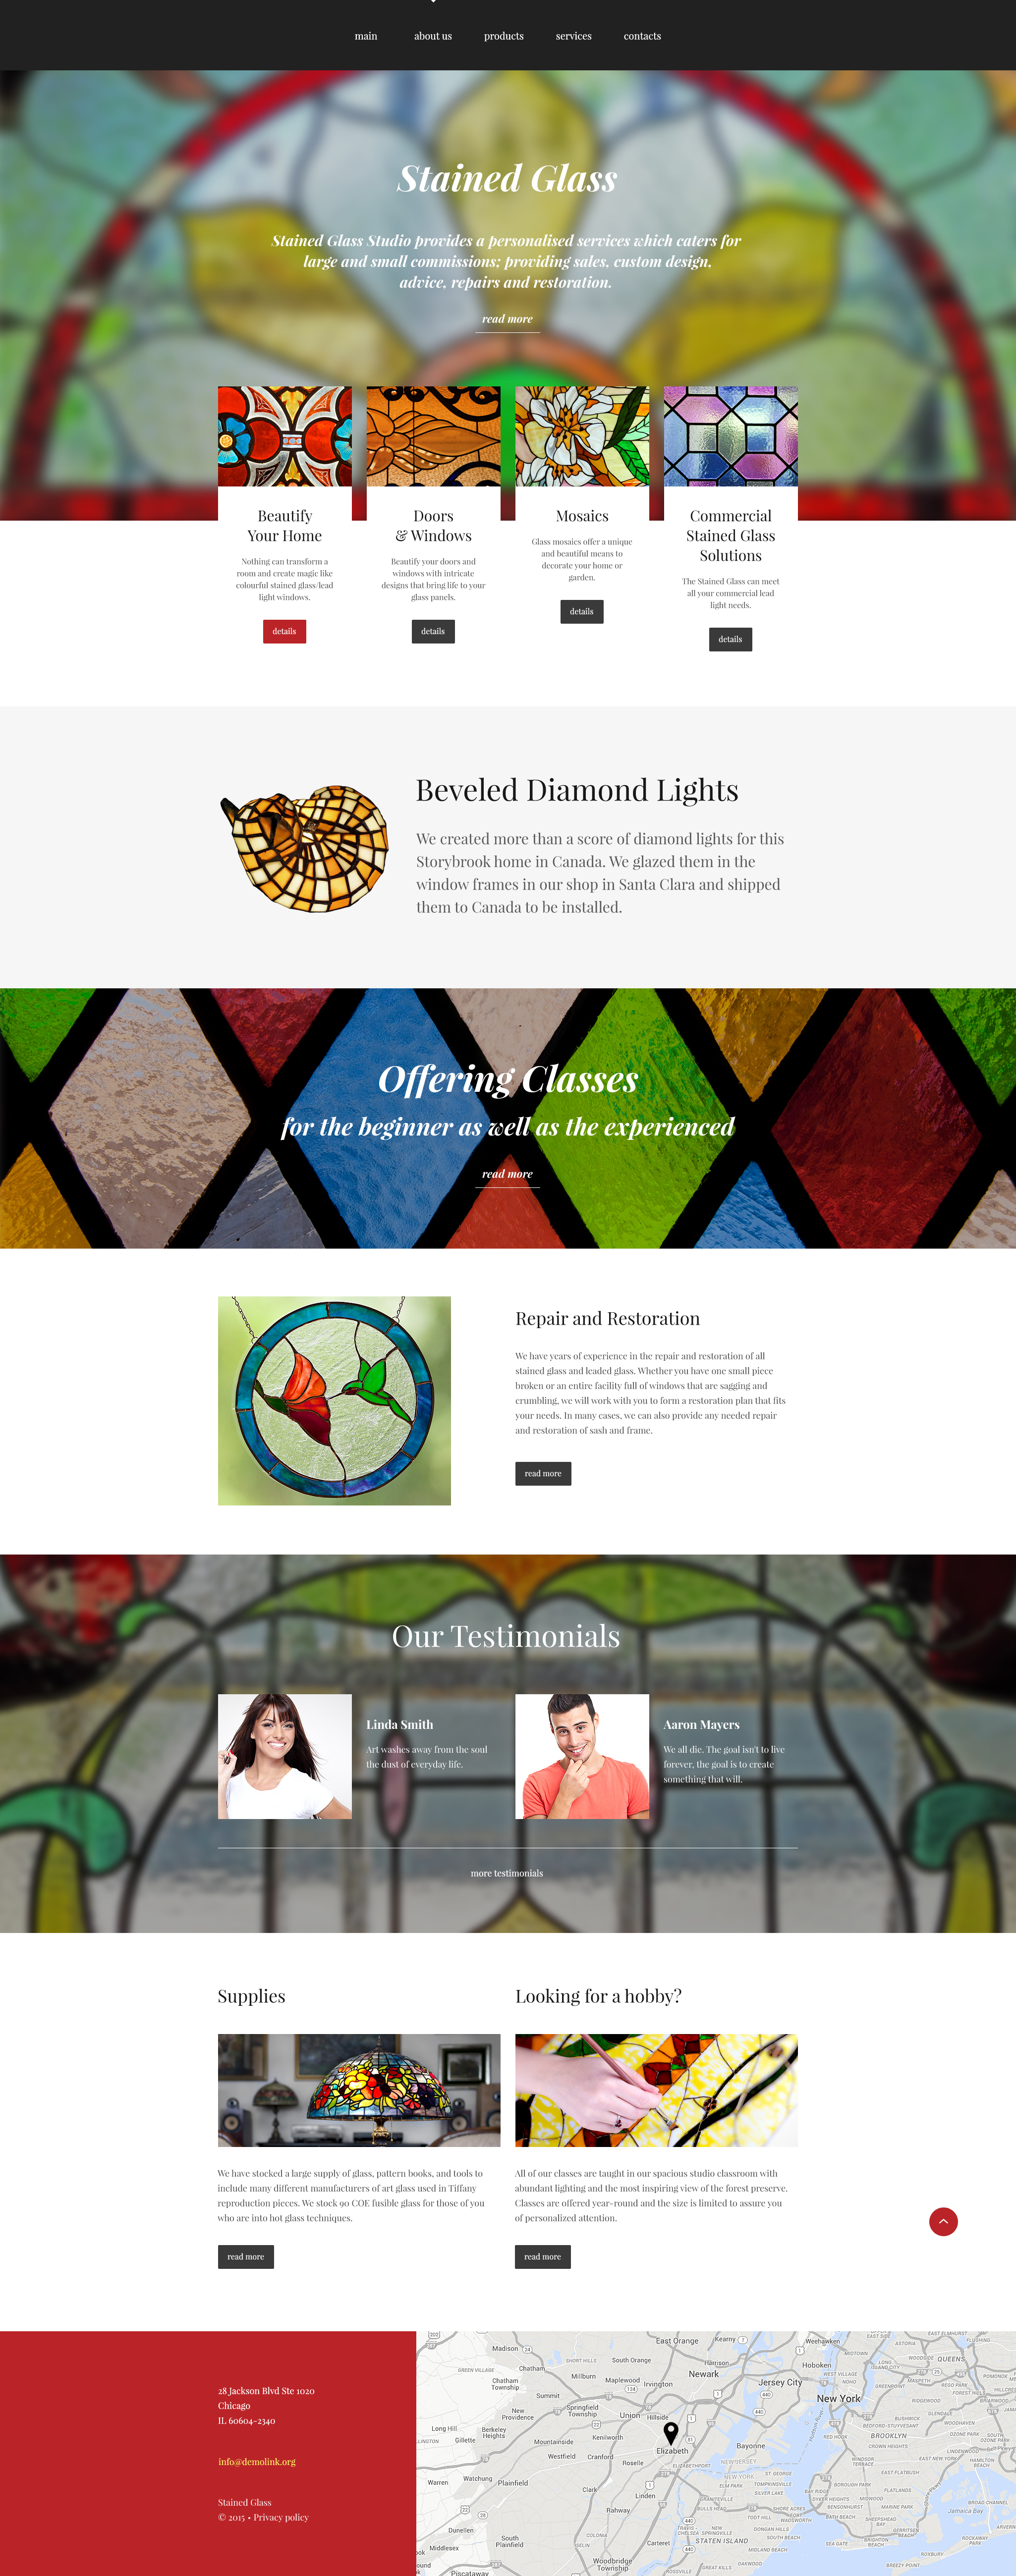 Stained Glass Studio Template Web №55294 - screenshot